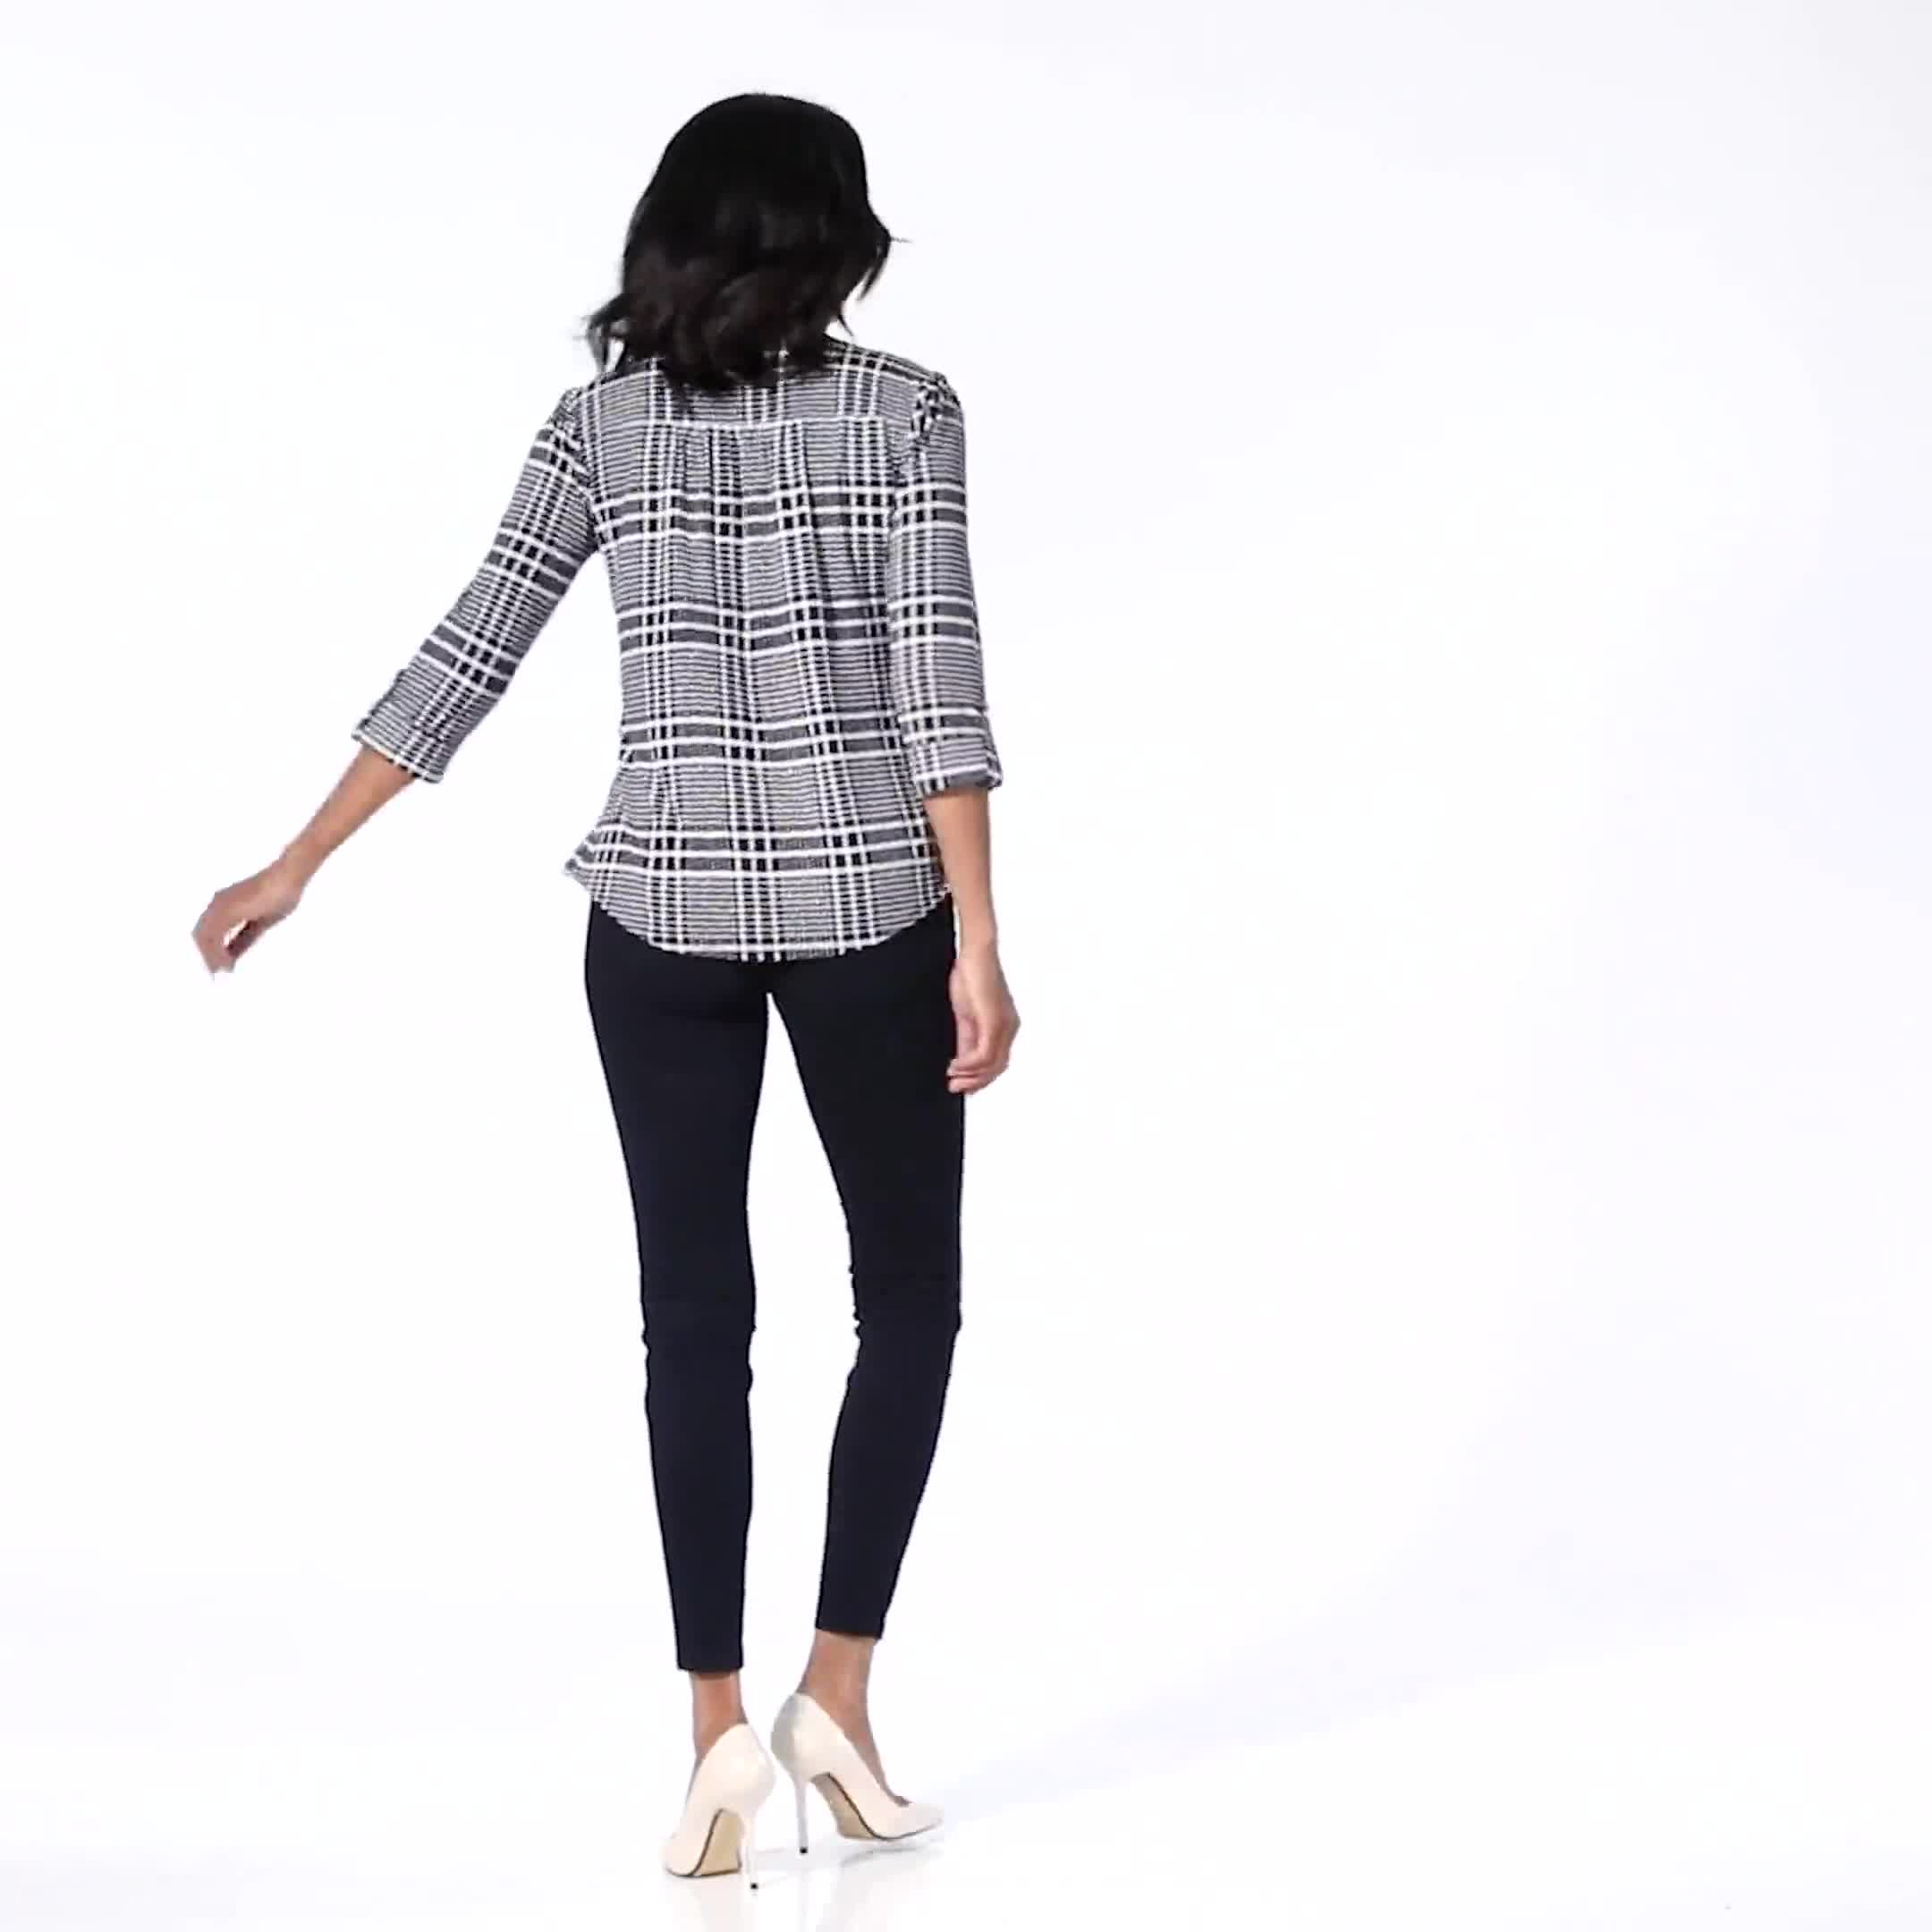 Ultra Stretch Denim Pull on Legging - Misses - Video